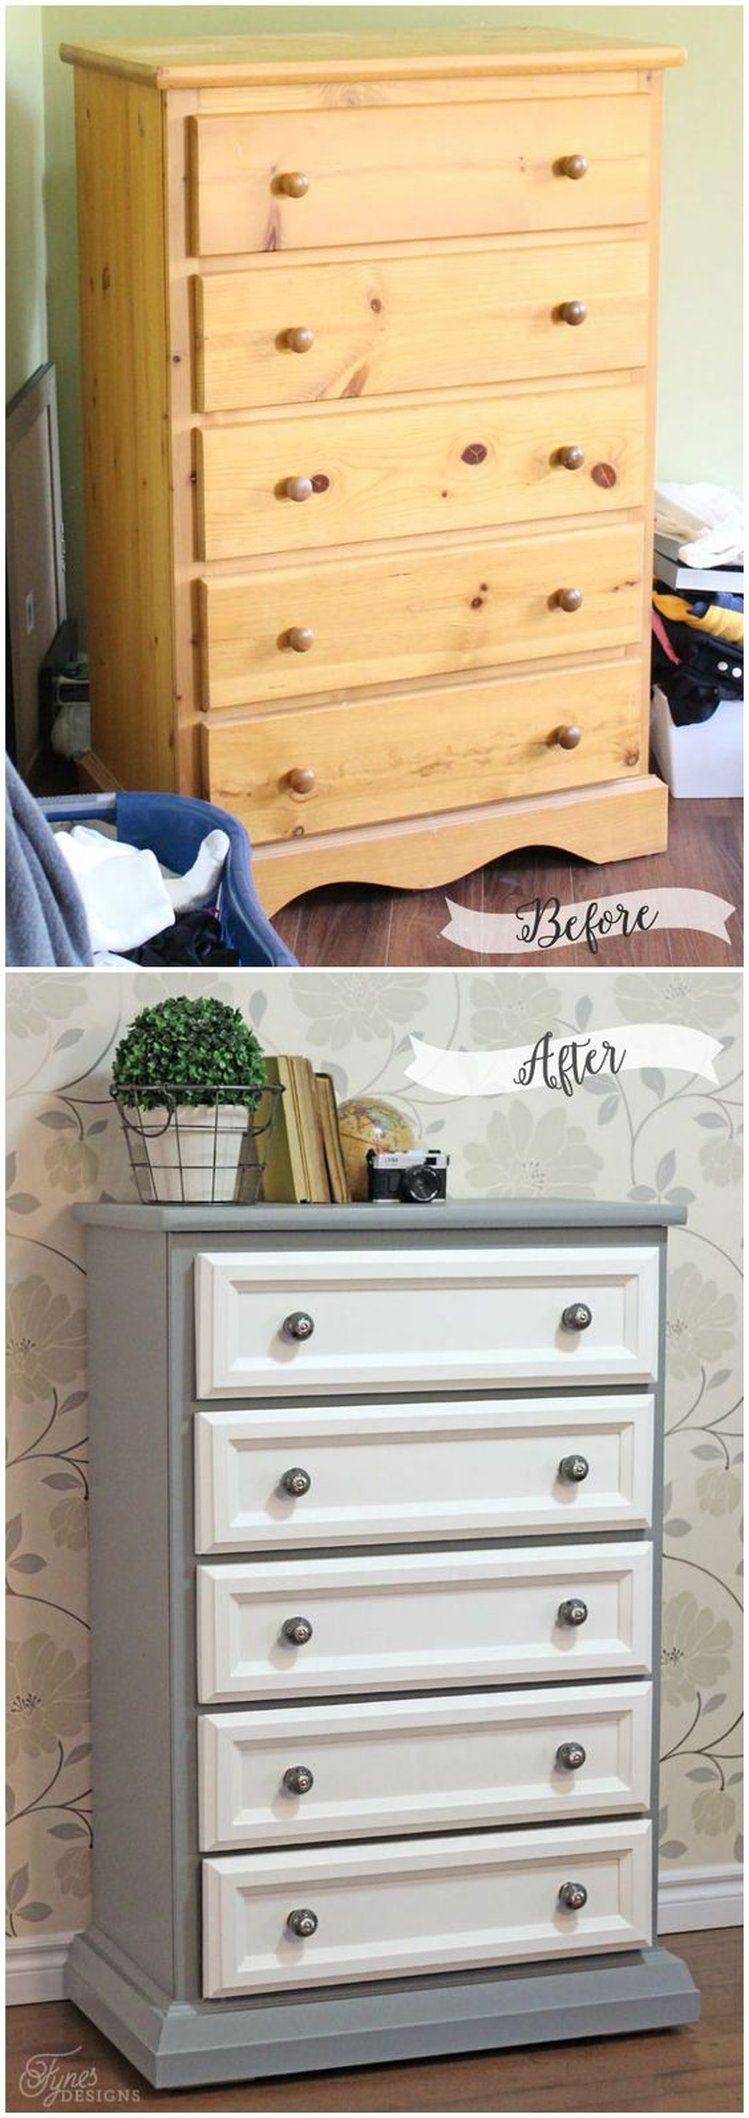 Nadaj Szafce Nowy Wygląd Chalk Painted Dressers Paint A Dresser Diy